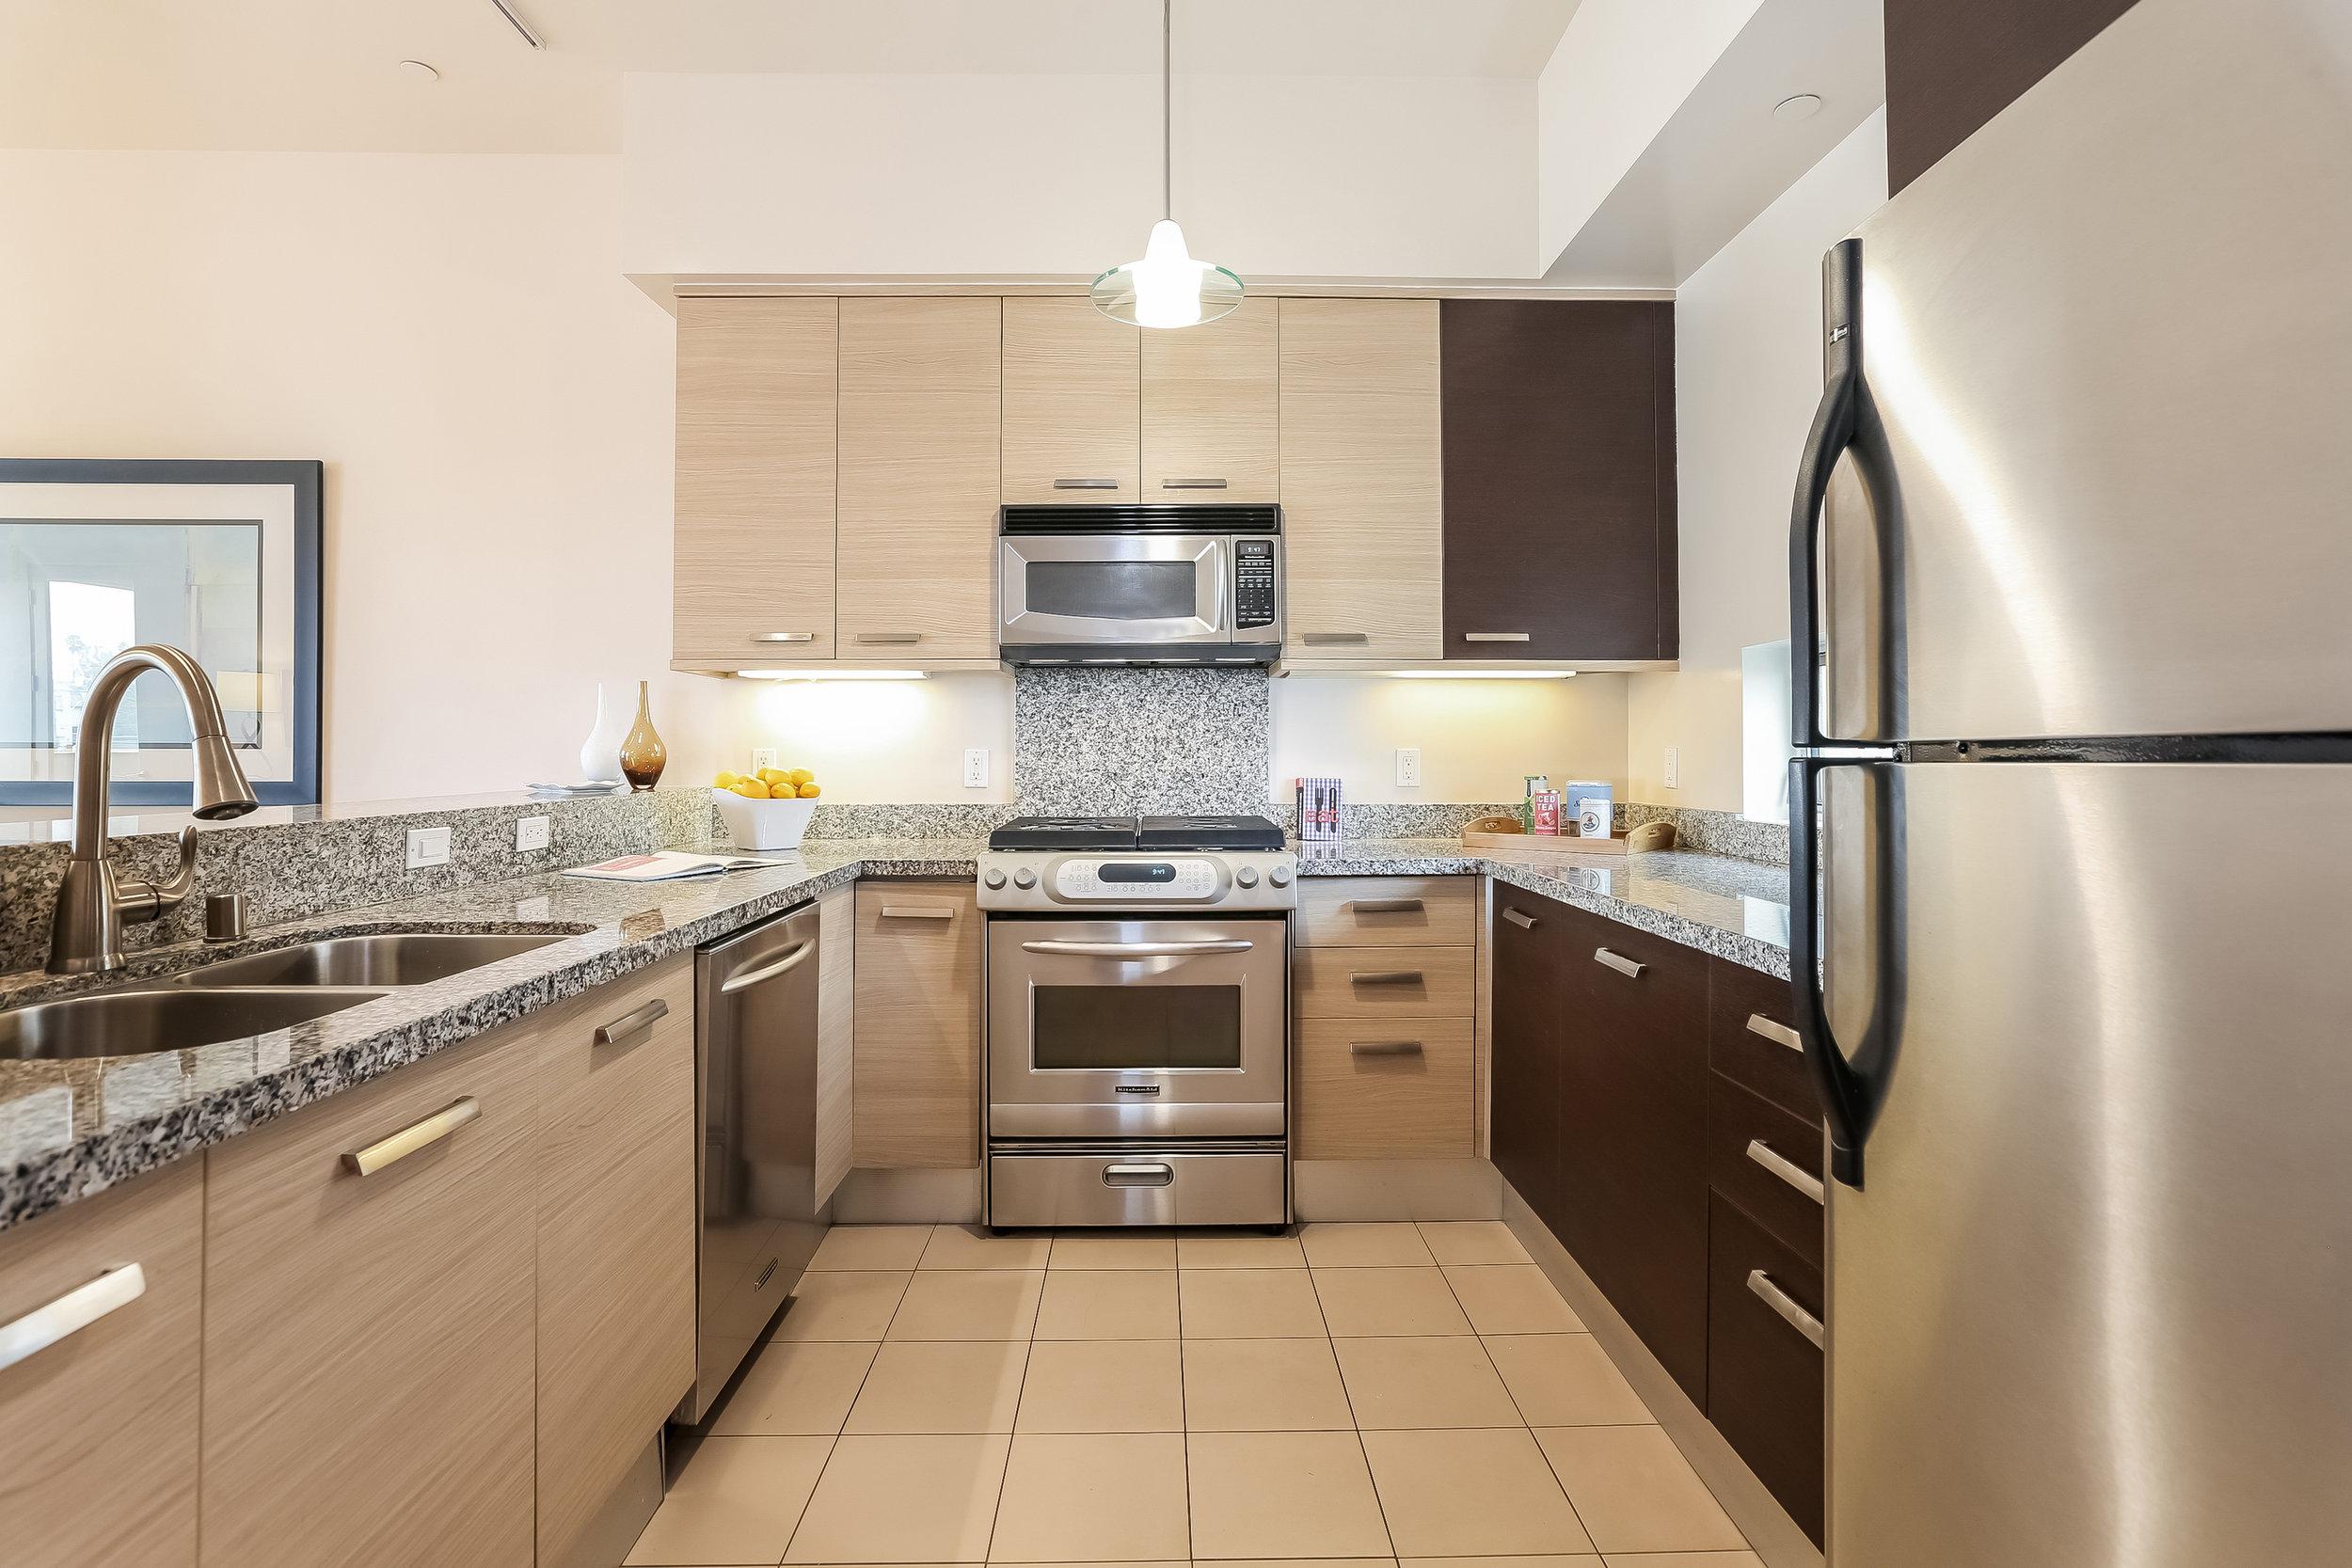 013-photo-kitchen-6209674 copy.jpg